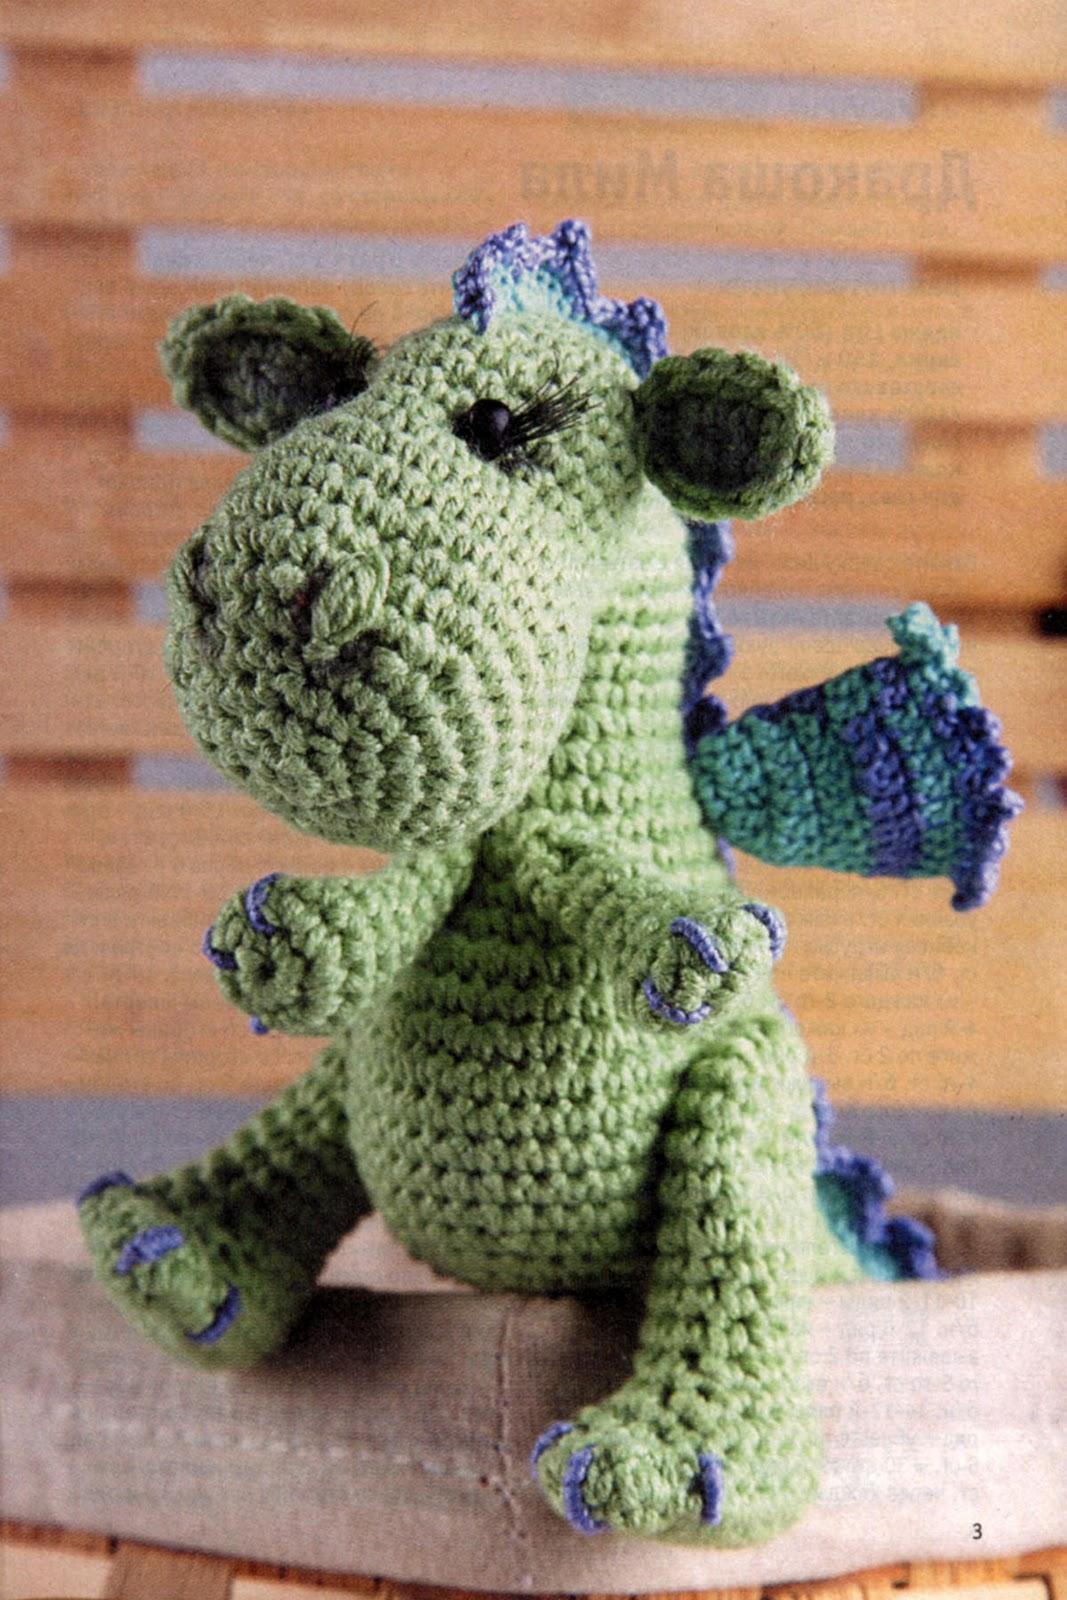 вязание крючком и спицамиcrochet And Knitting вязаная копилка 1